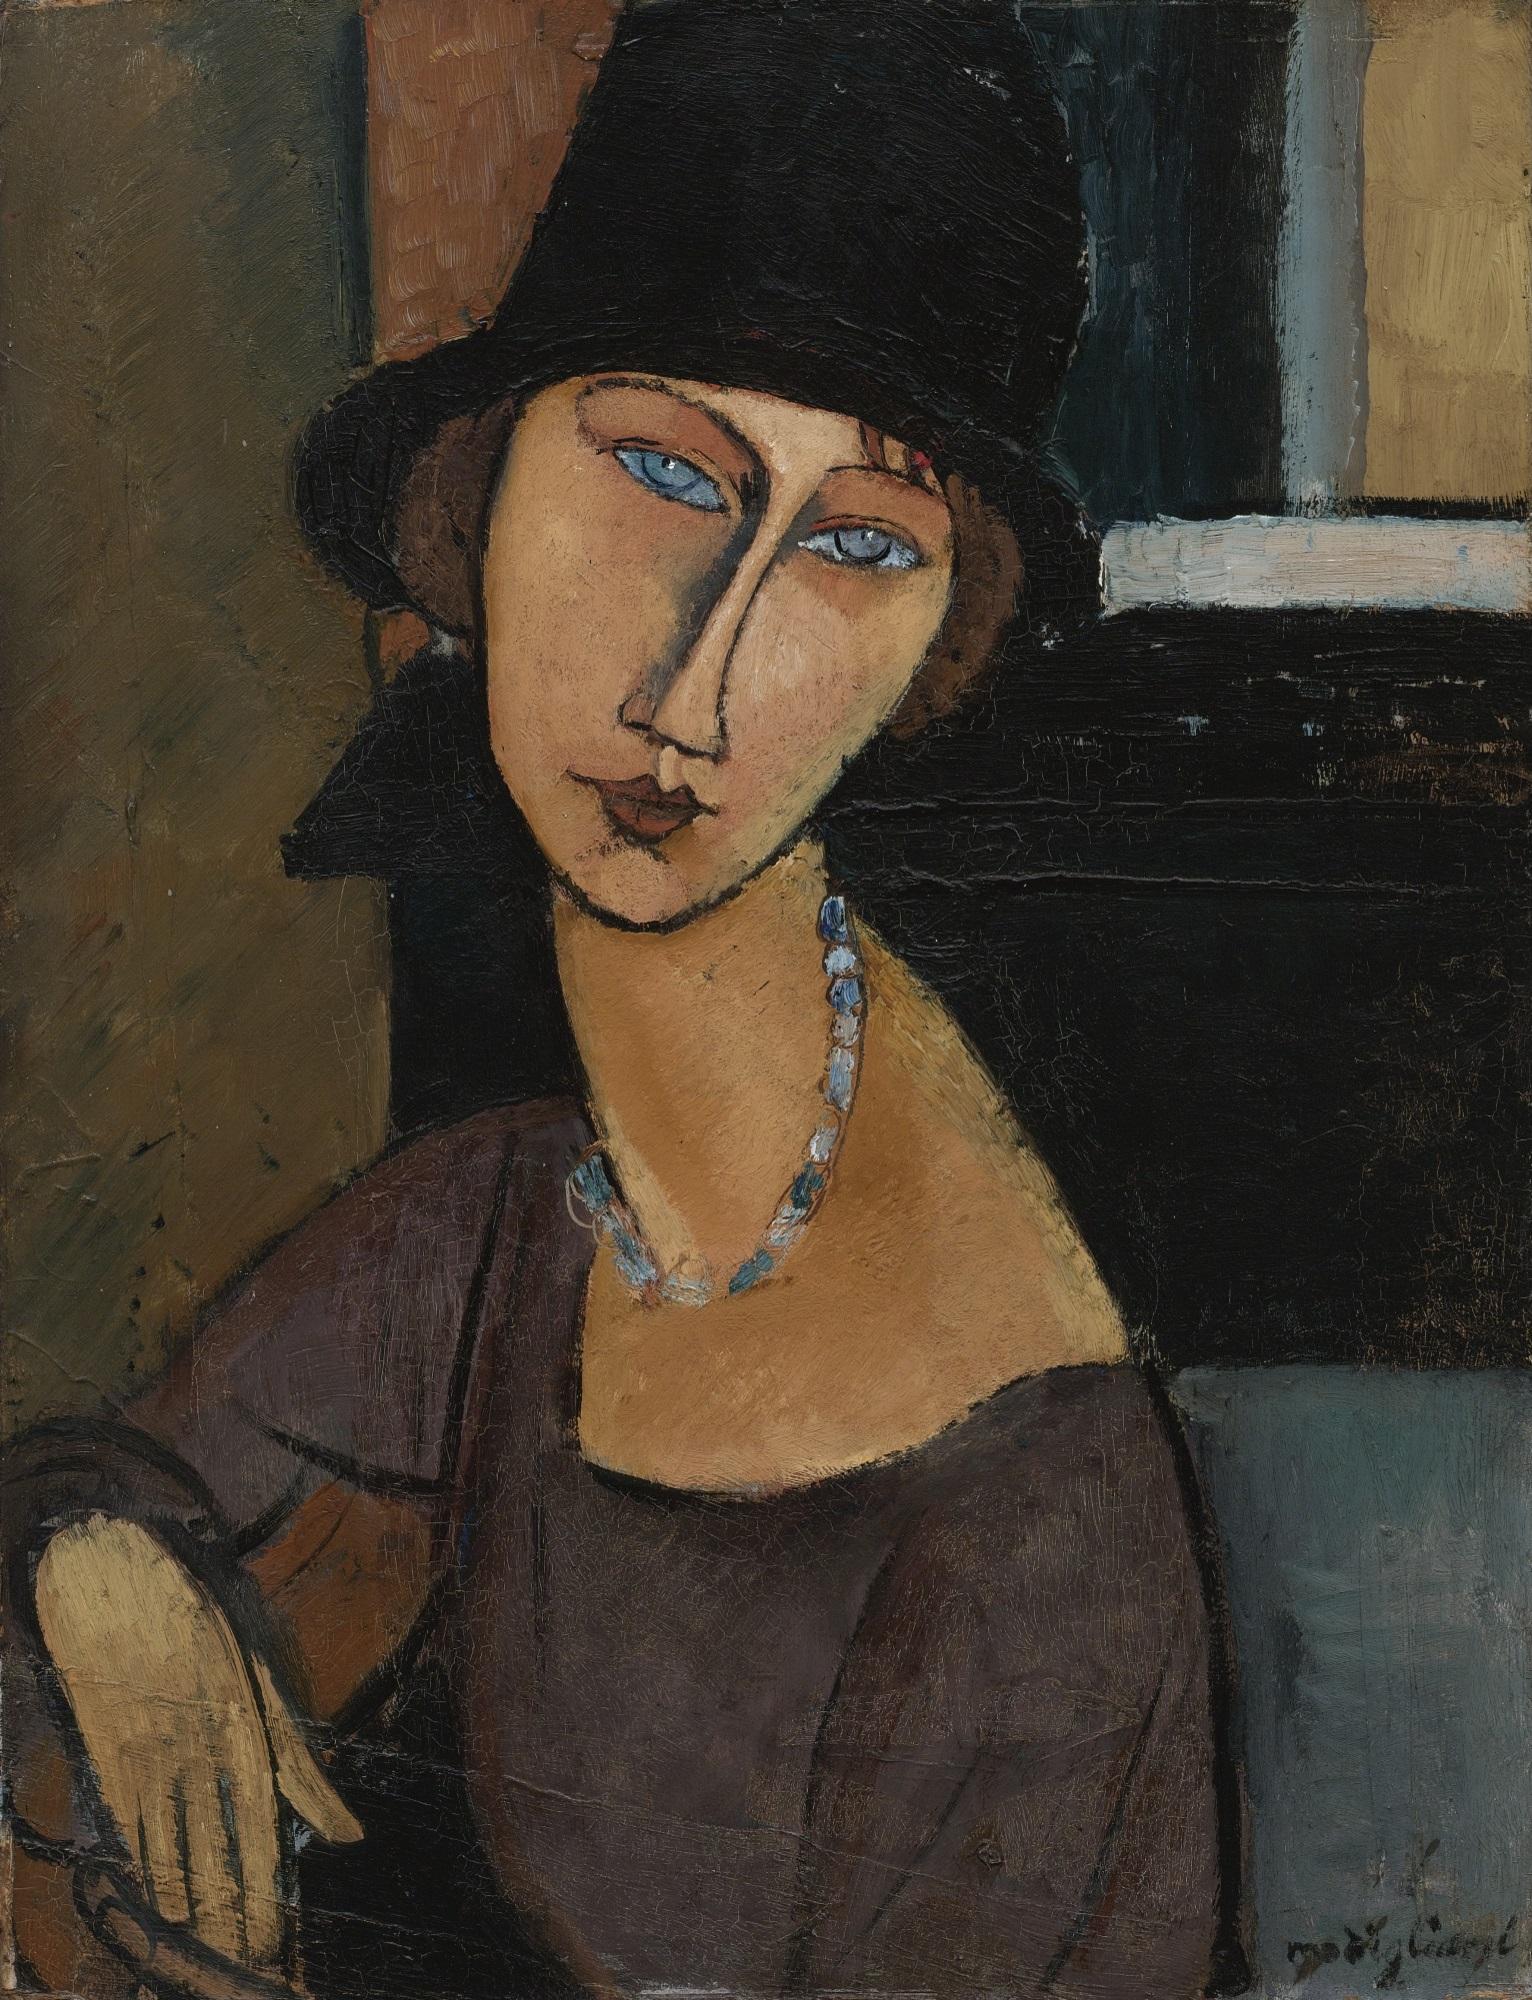 Fichier:Jeanne Hébuterne (au chapeau) by Amedeo Modigliani.jpg — Wikipédia